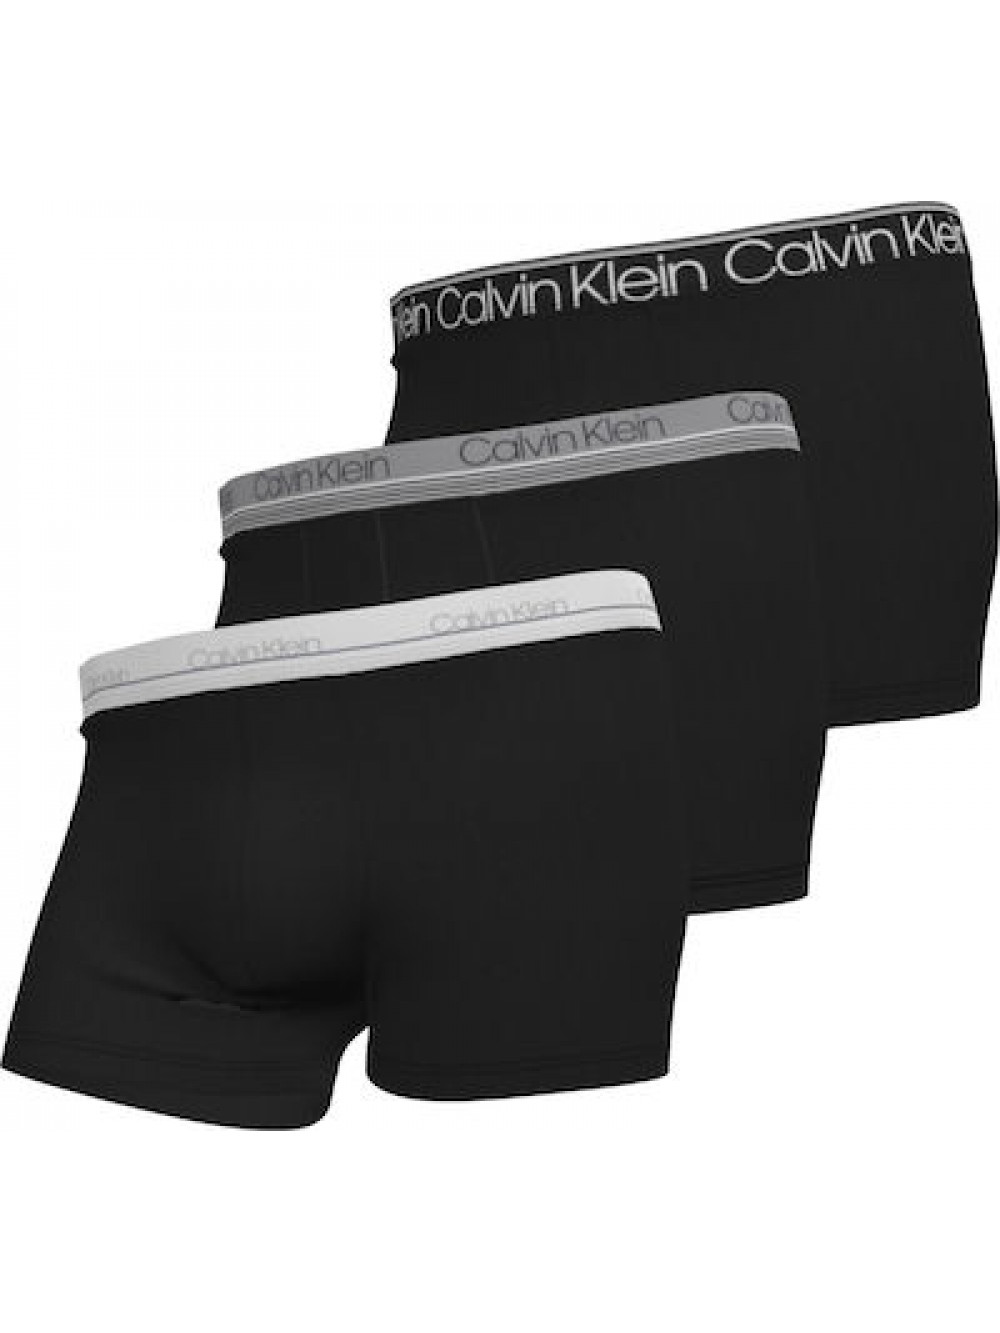 Pánske boxerky Calvin Klein Cotton Stretch Trunk 3-pack čierne